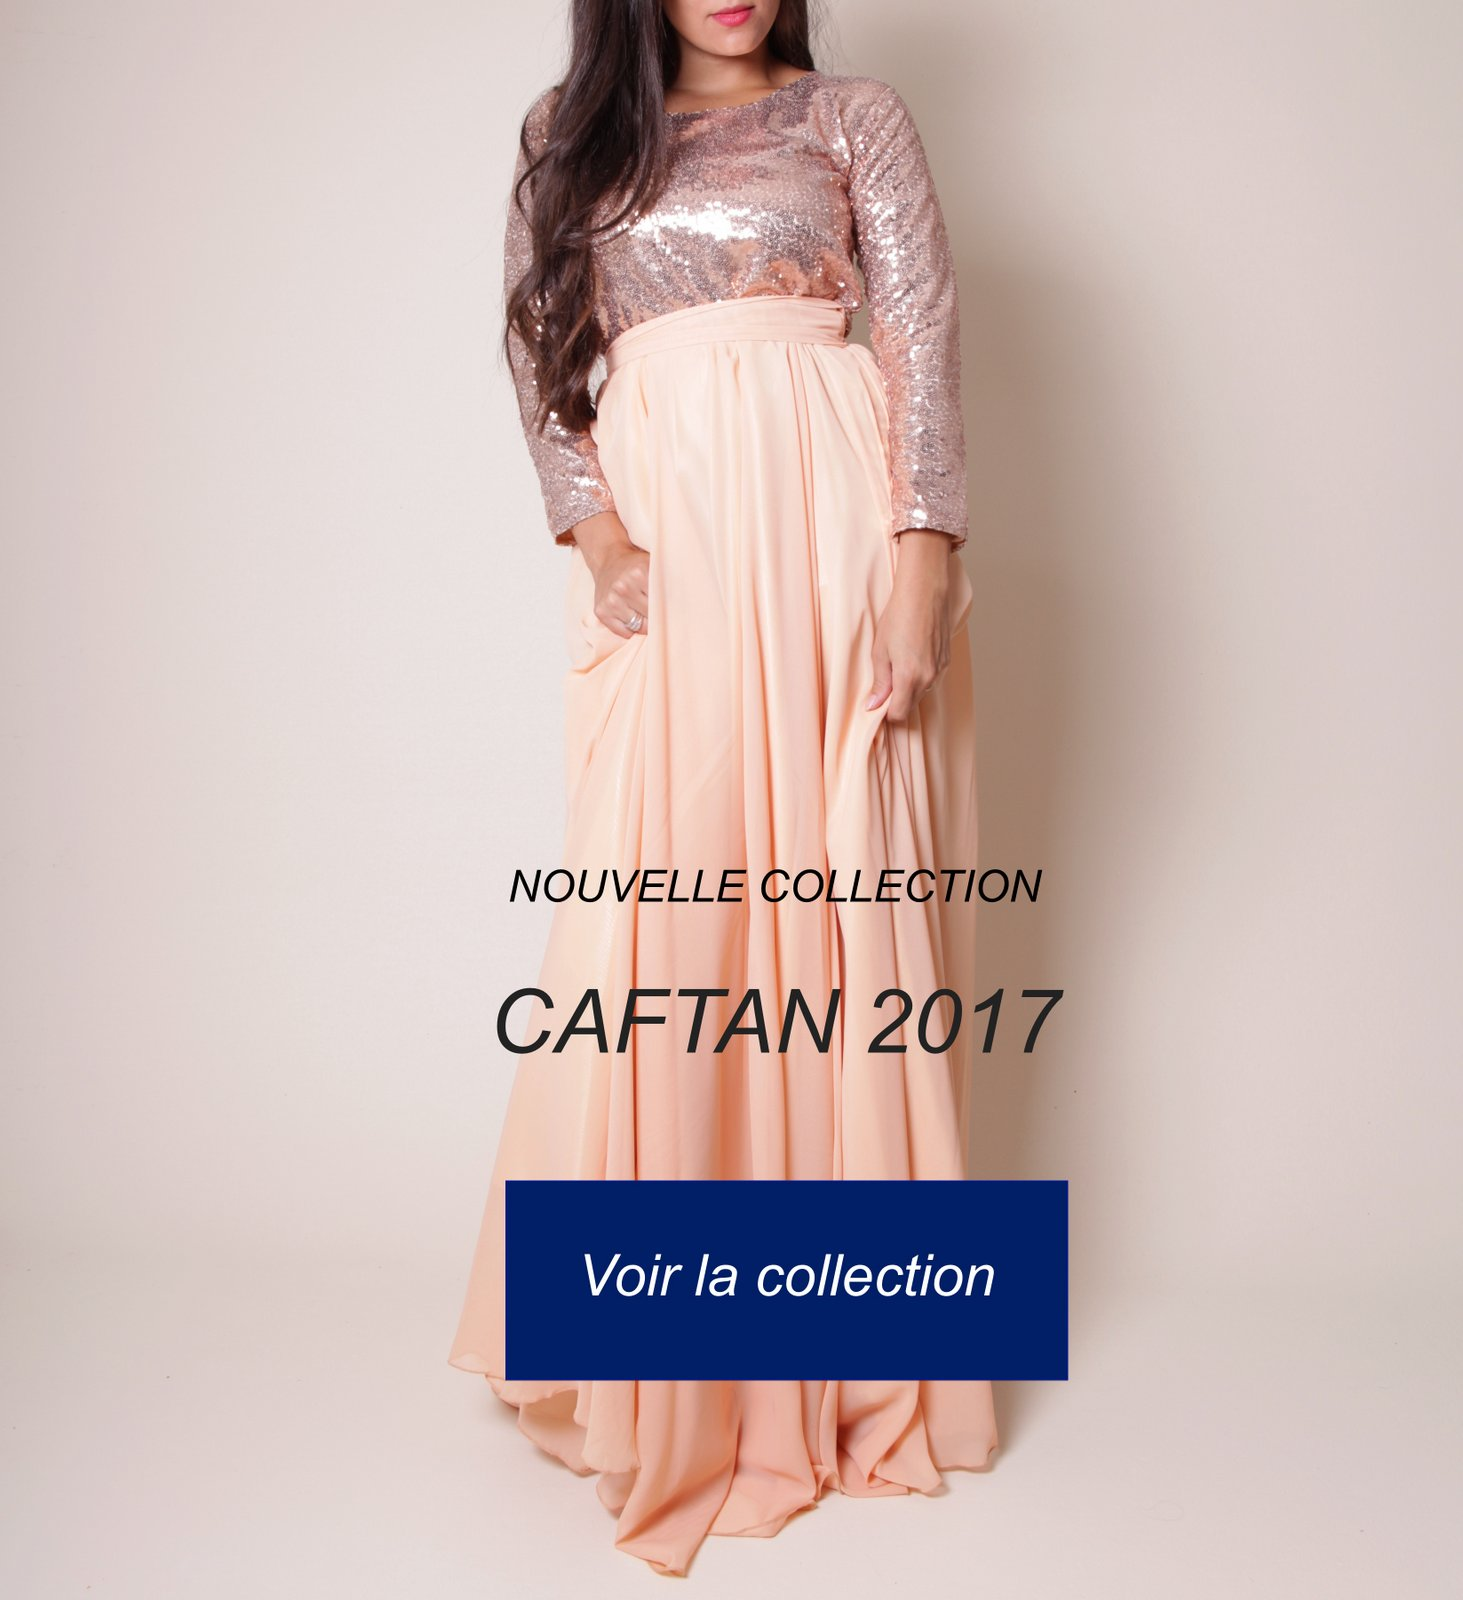 9a4aacf7c4d Caftan   Takchita pas cher - Caftan By Richard Amina